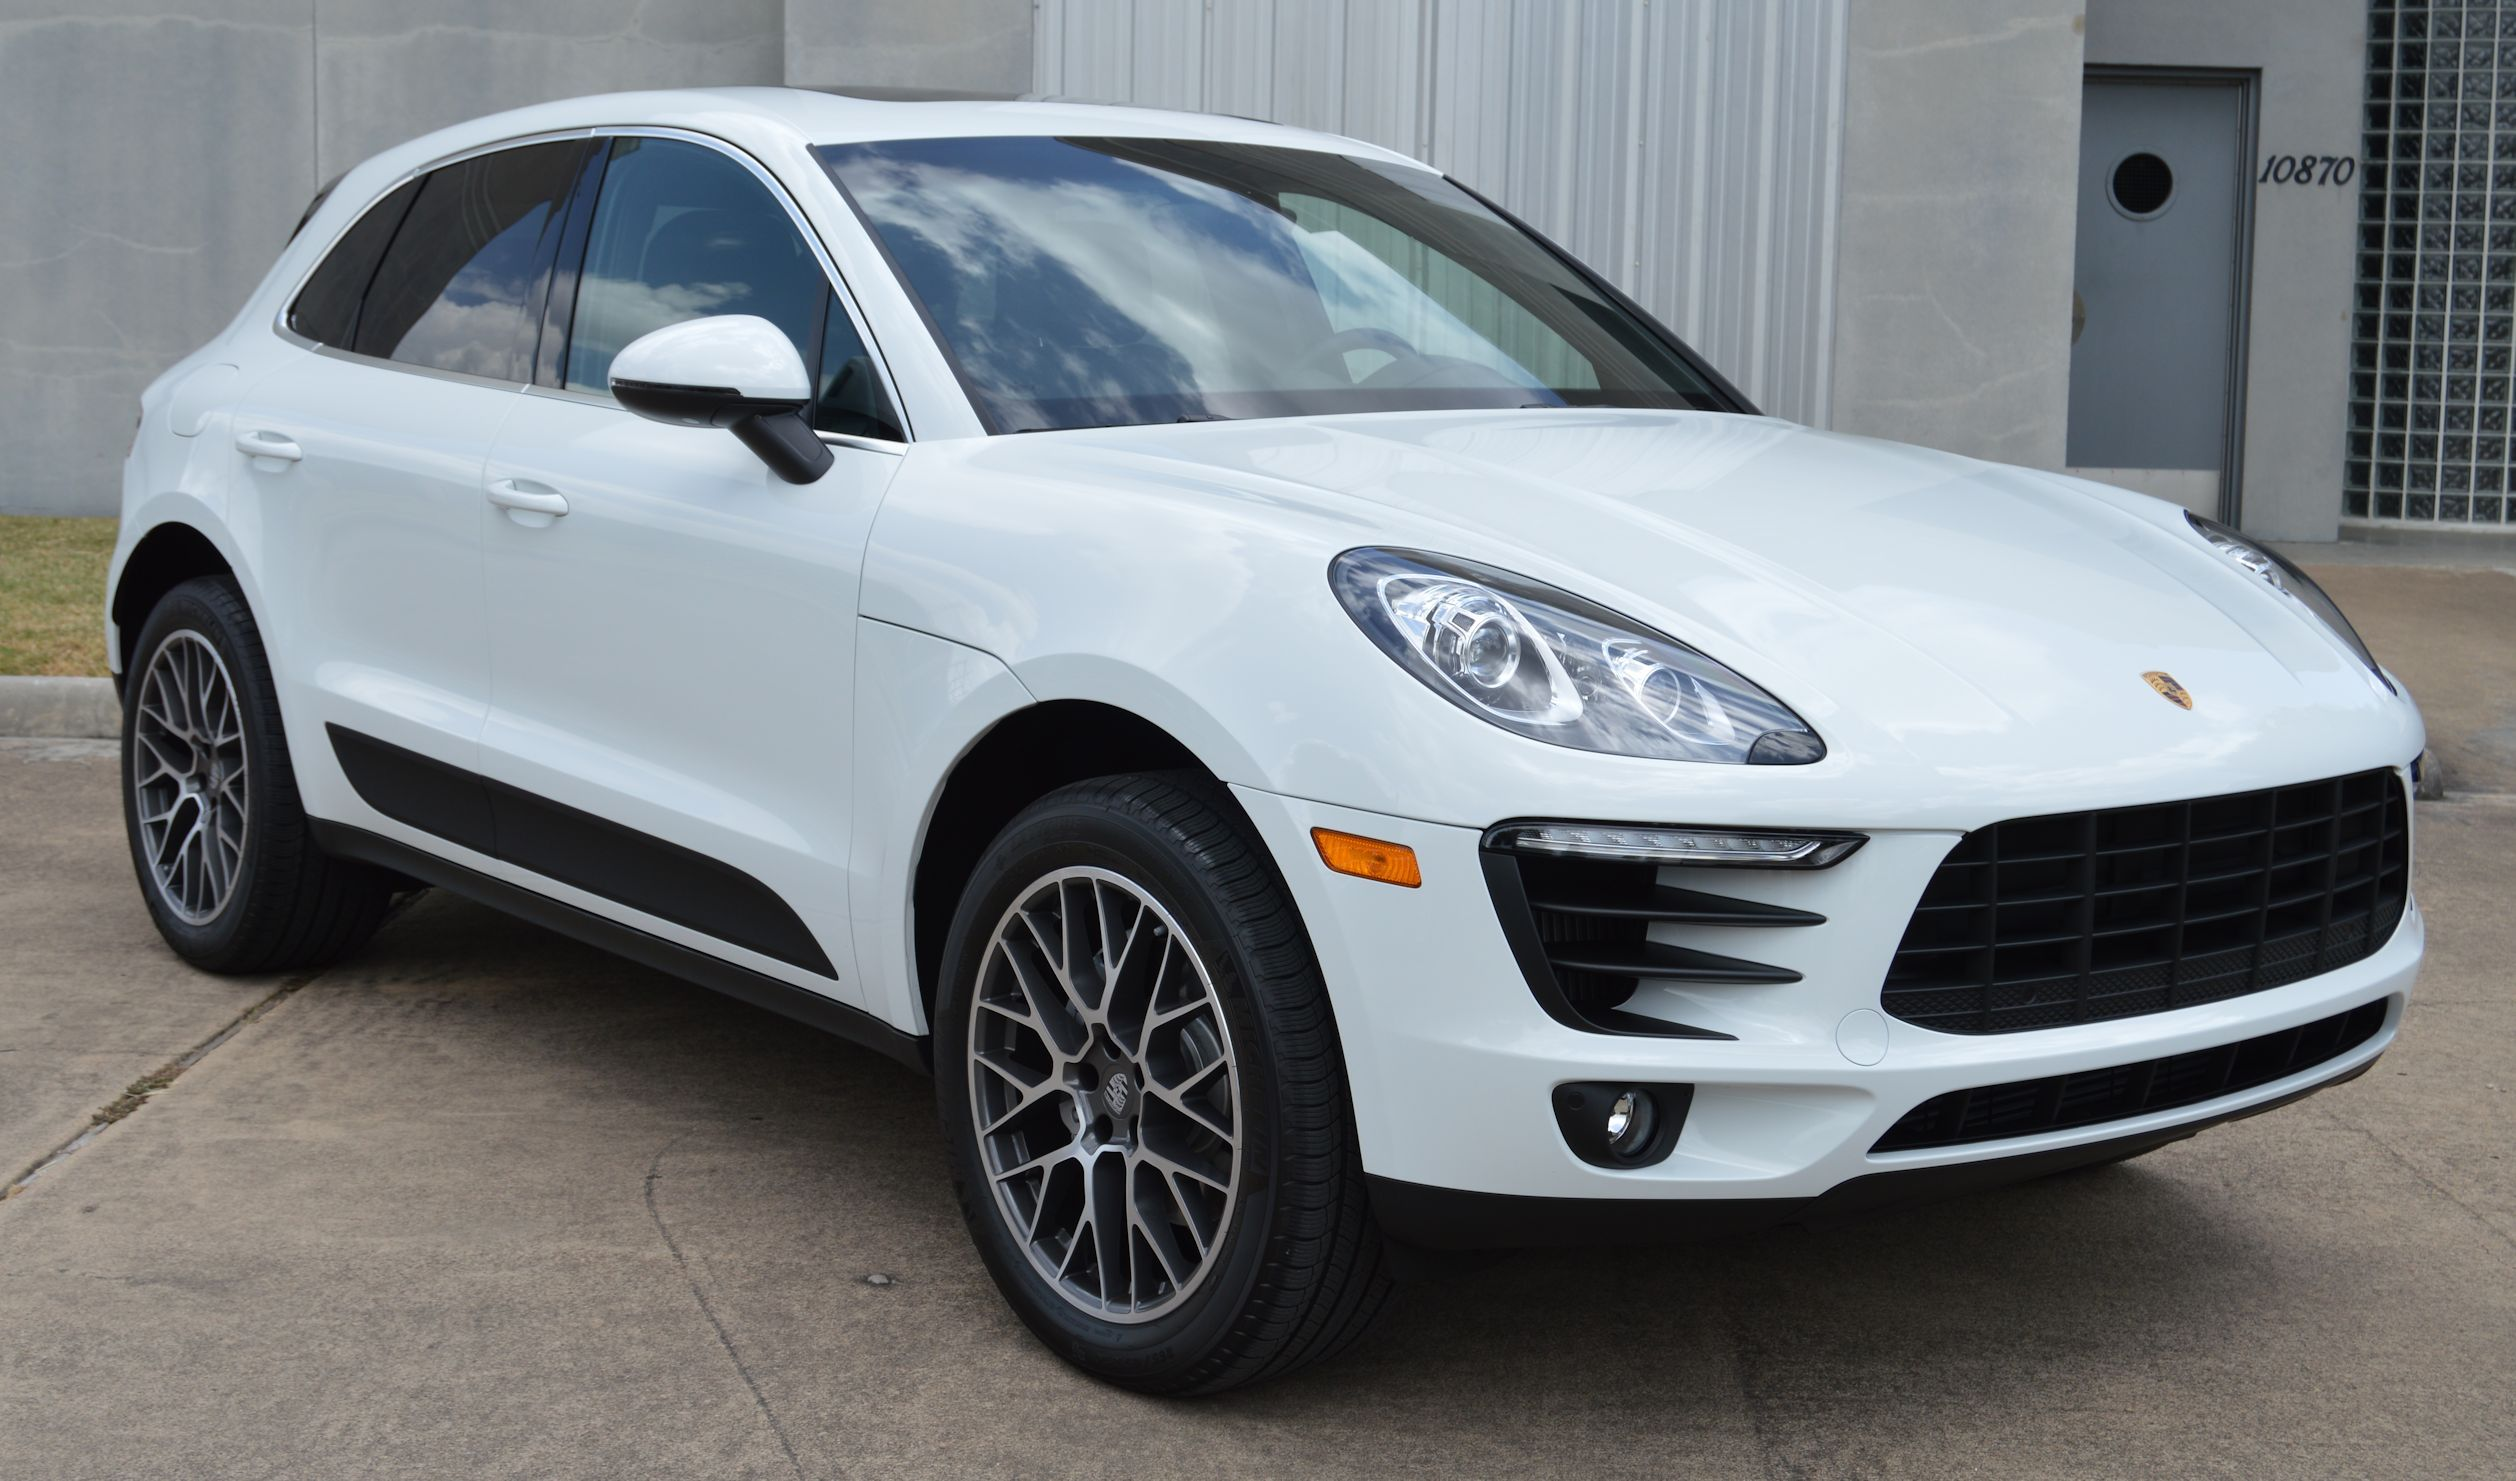 2016 Porsche Macan S White Black